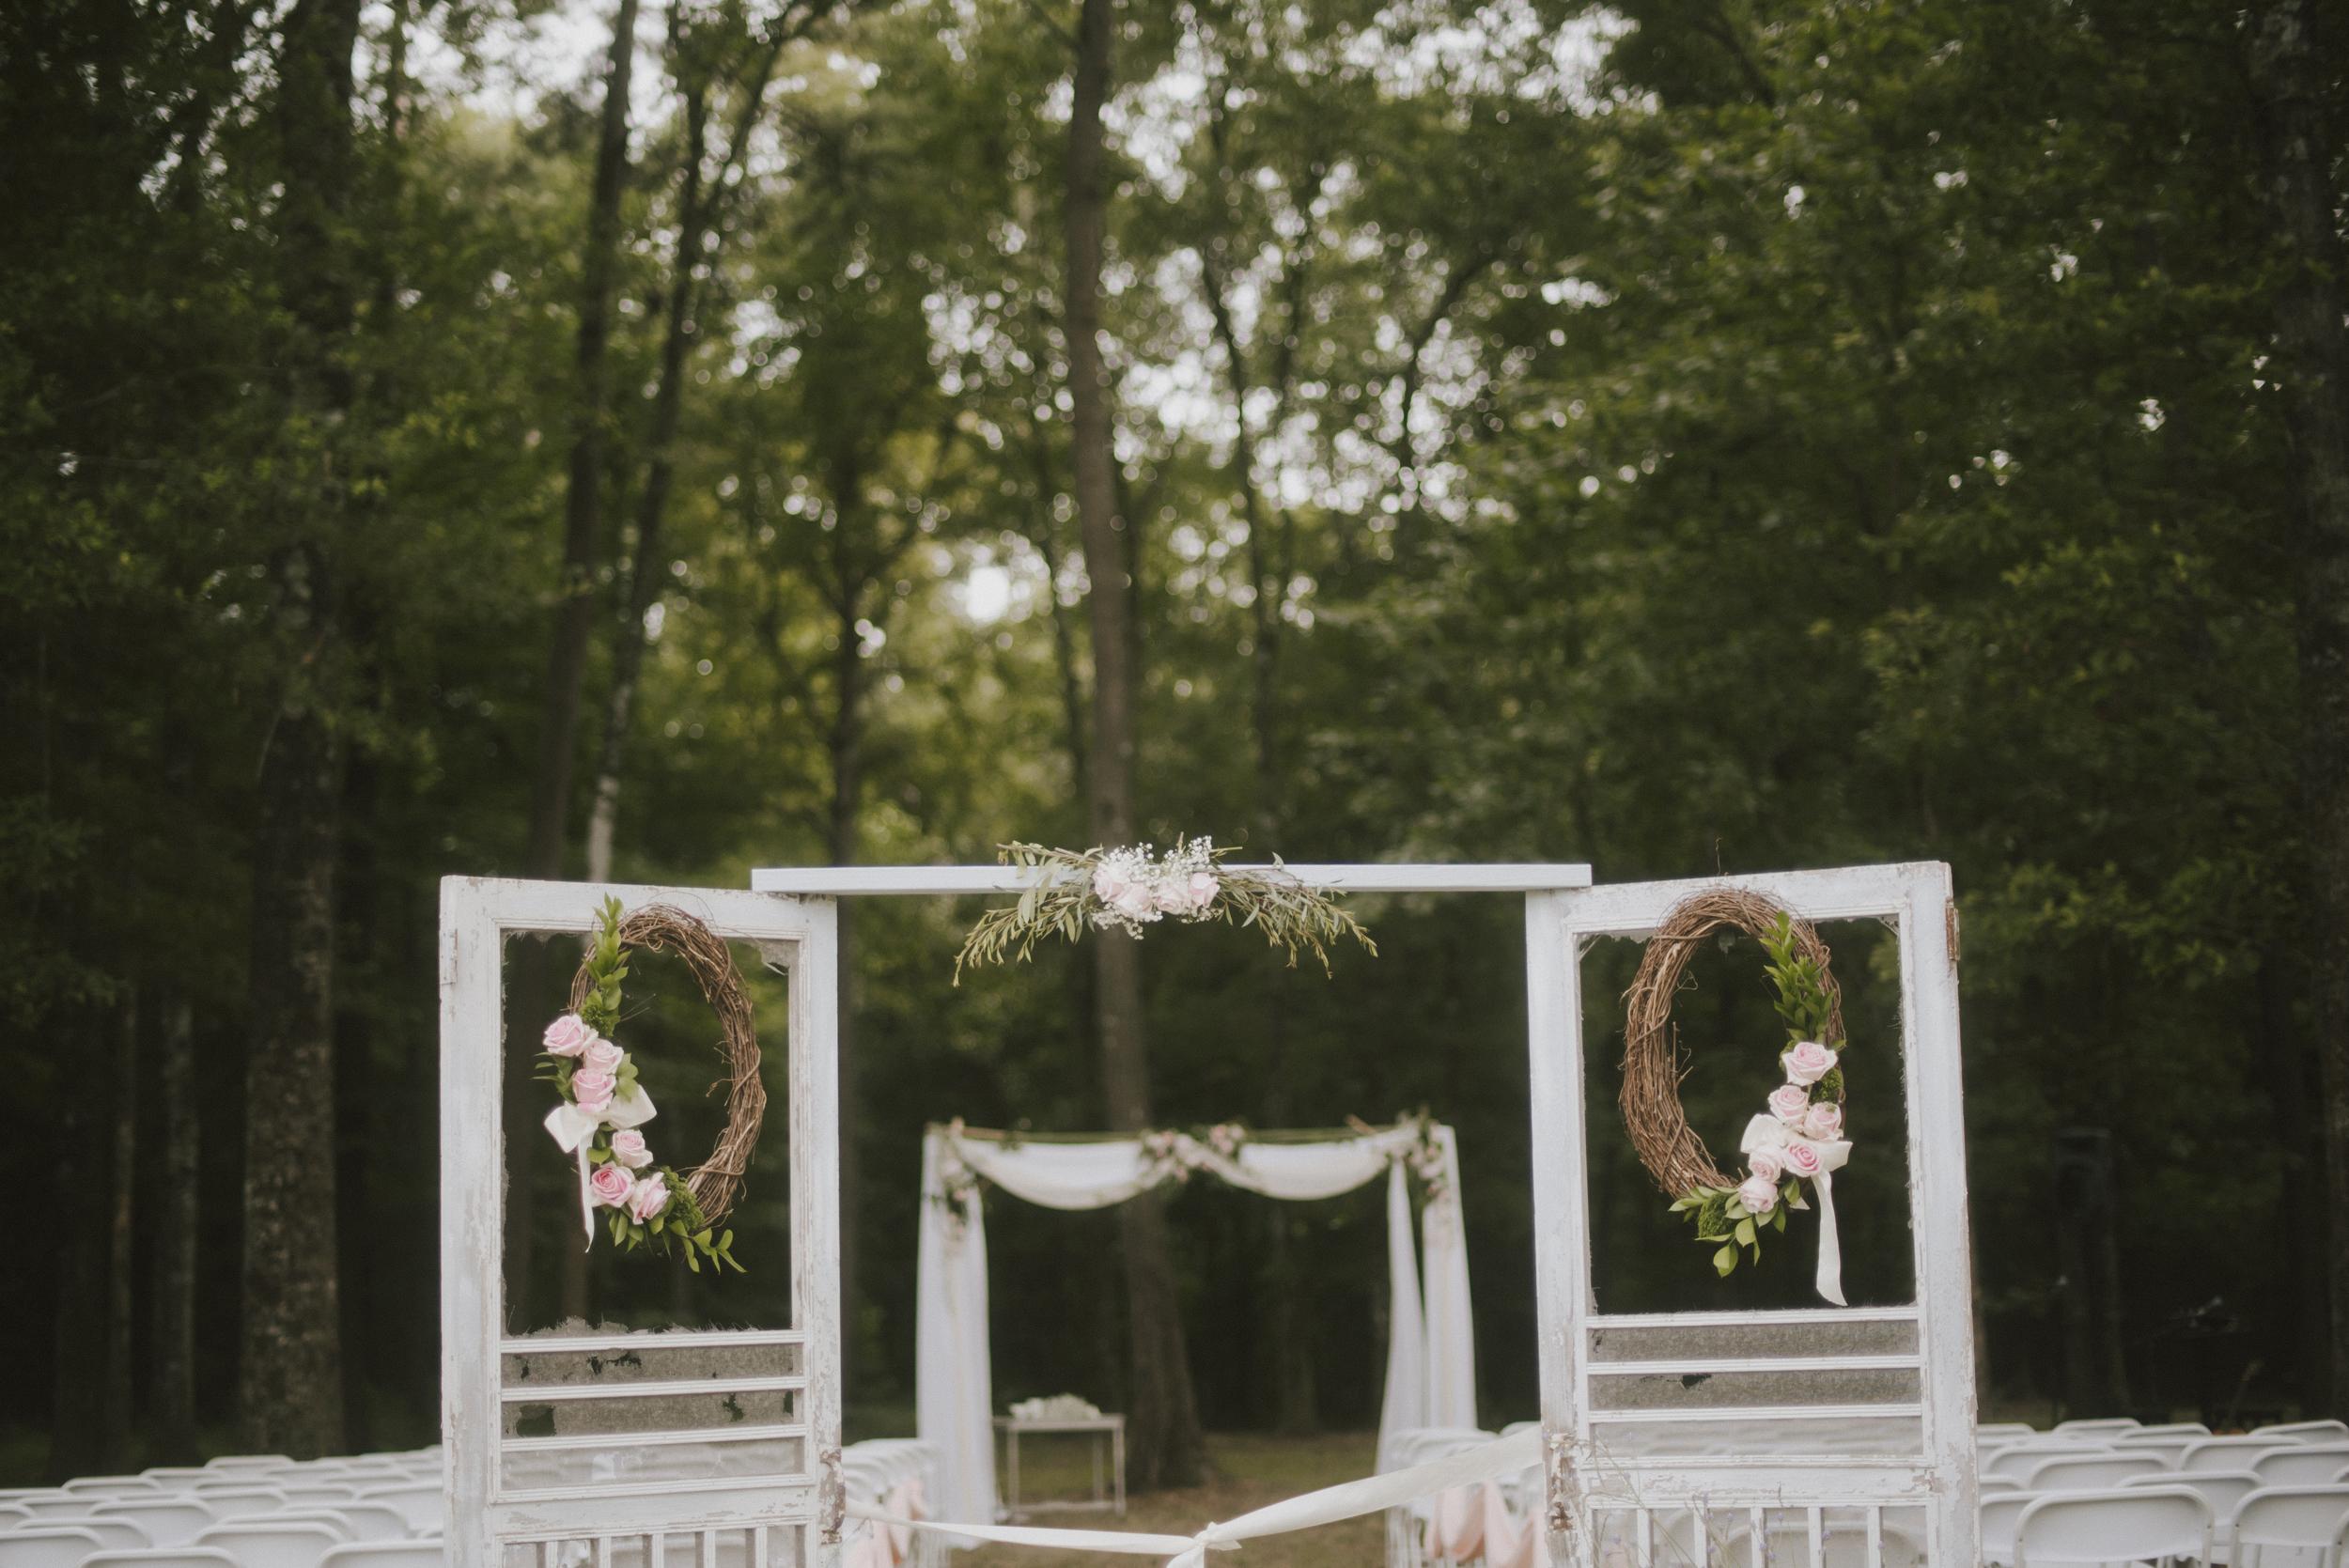 ofRen_weddingphotographer-118.jpg